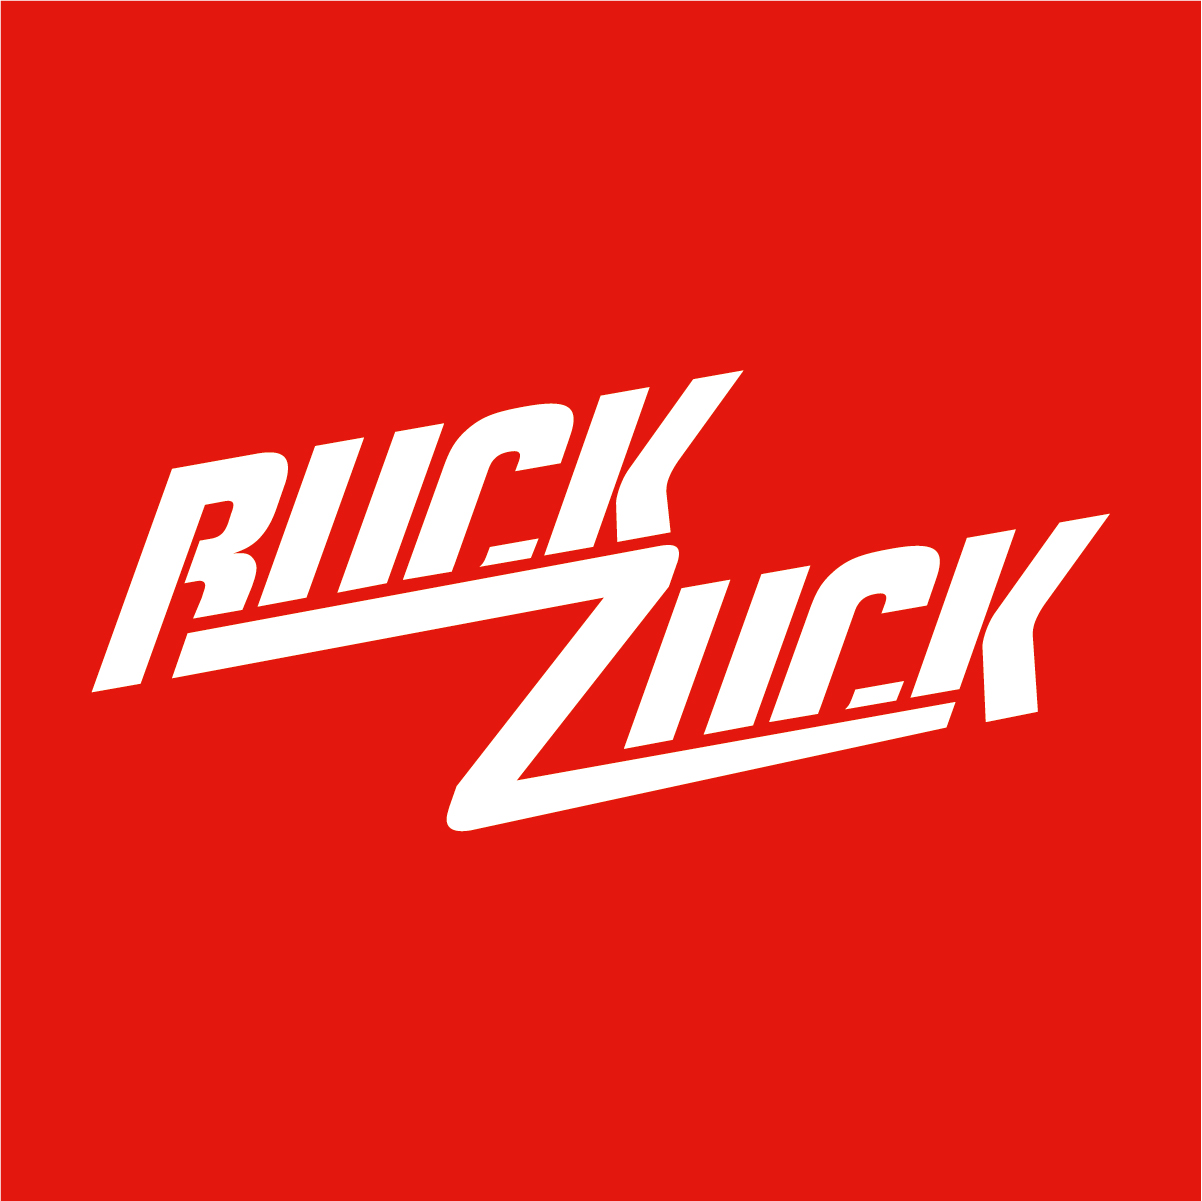 MUSTER CERAMIN VARIO 3mm Fliese x-tra breit+lang Tadelakt weiss PVC-frei